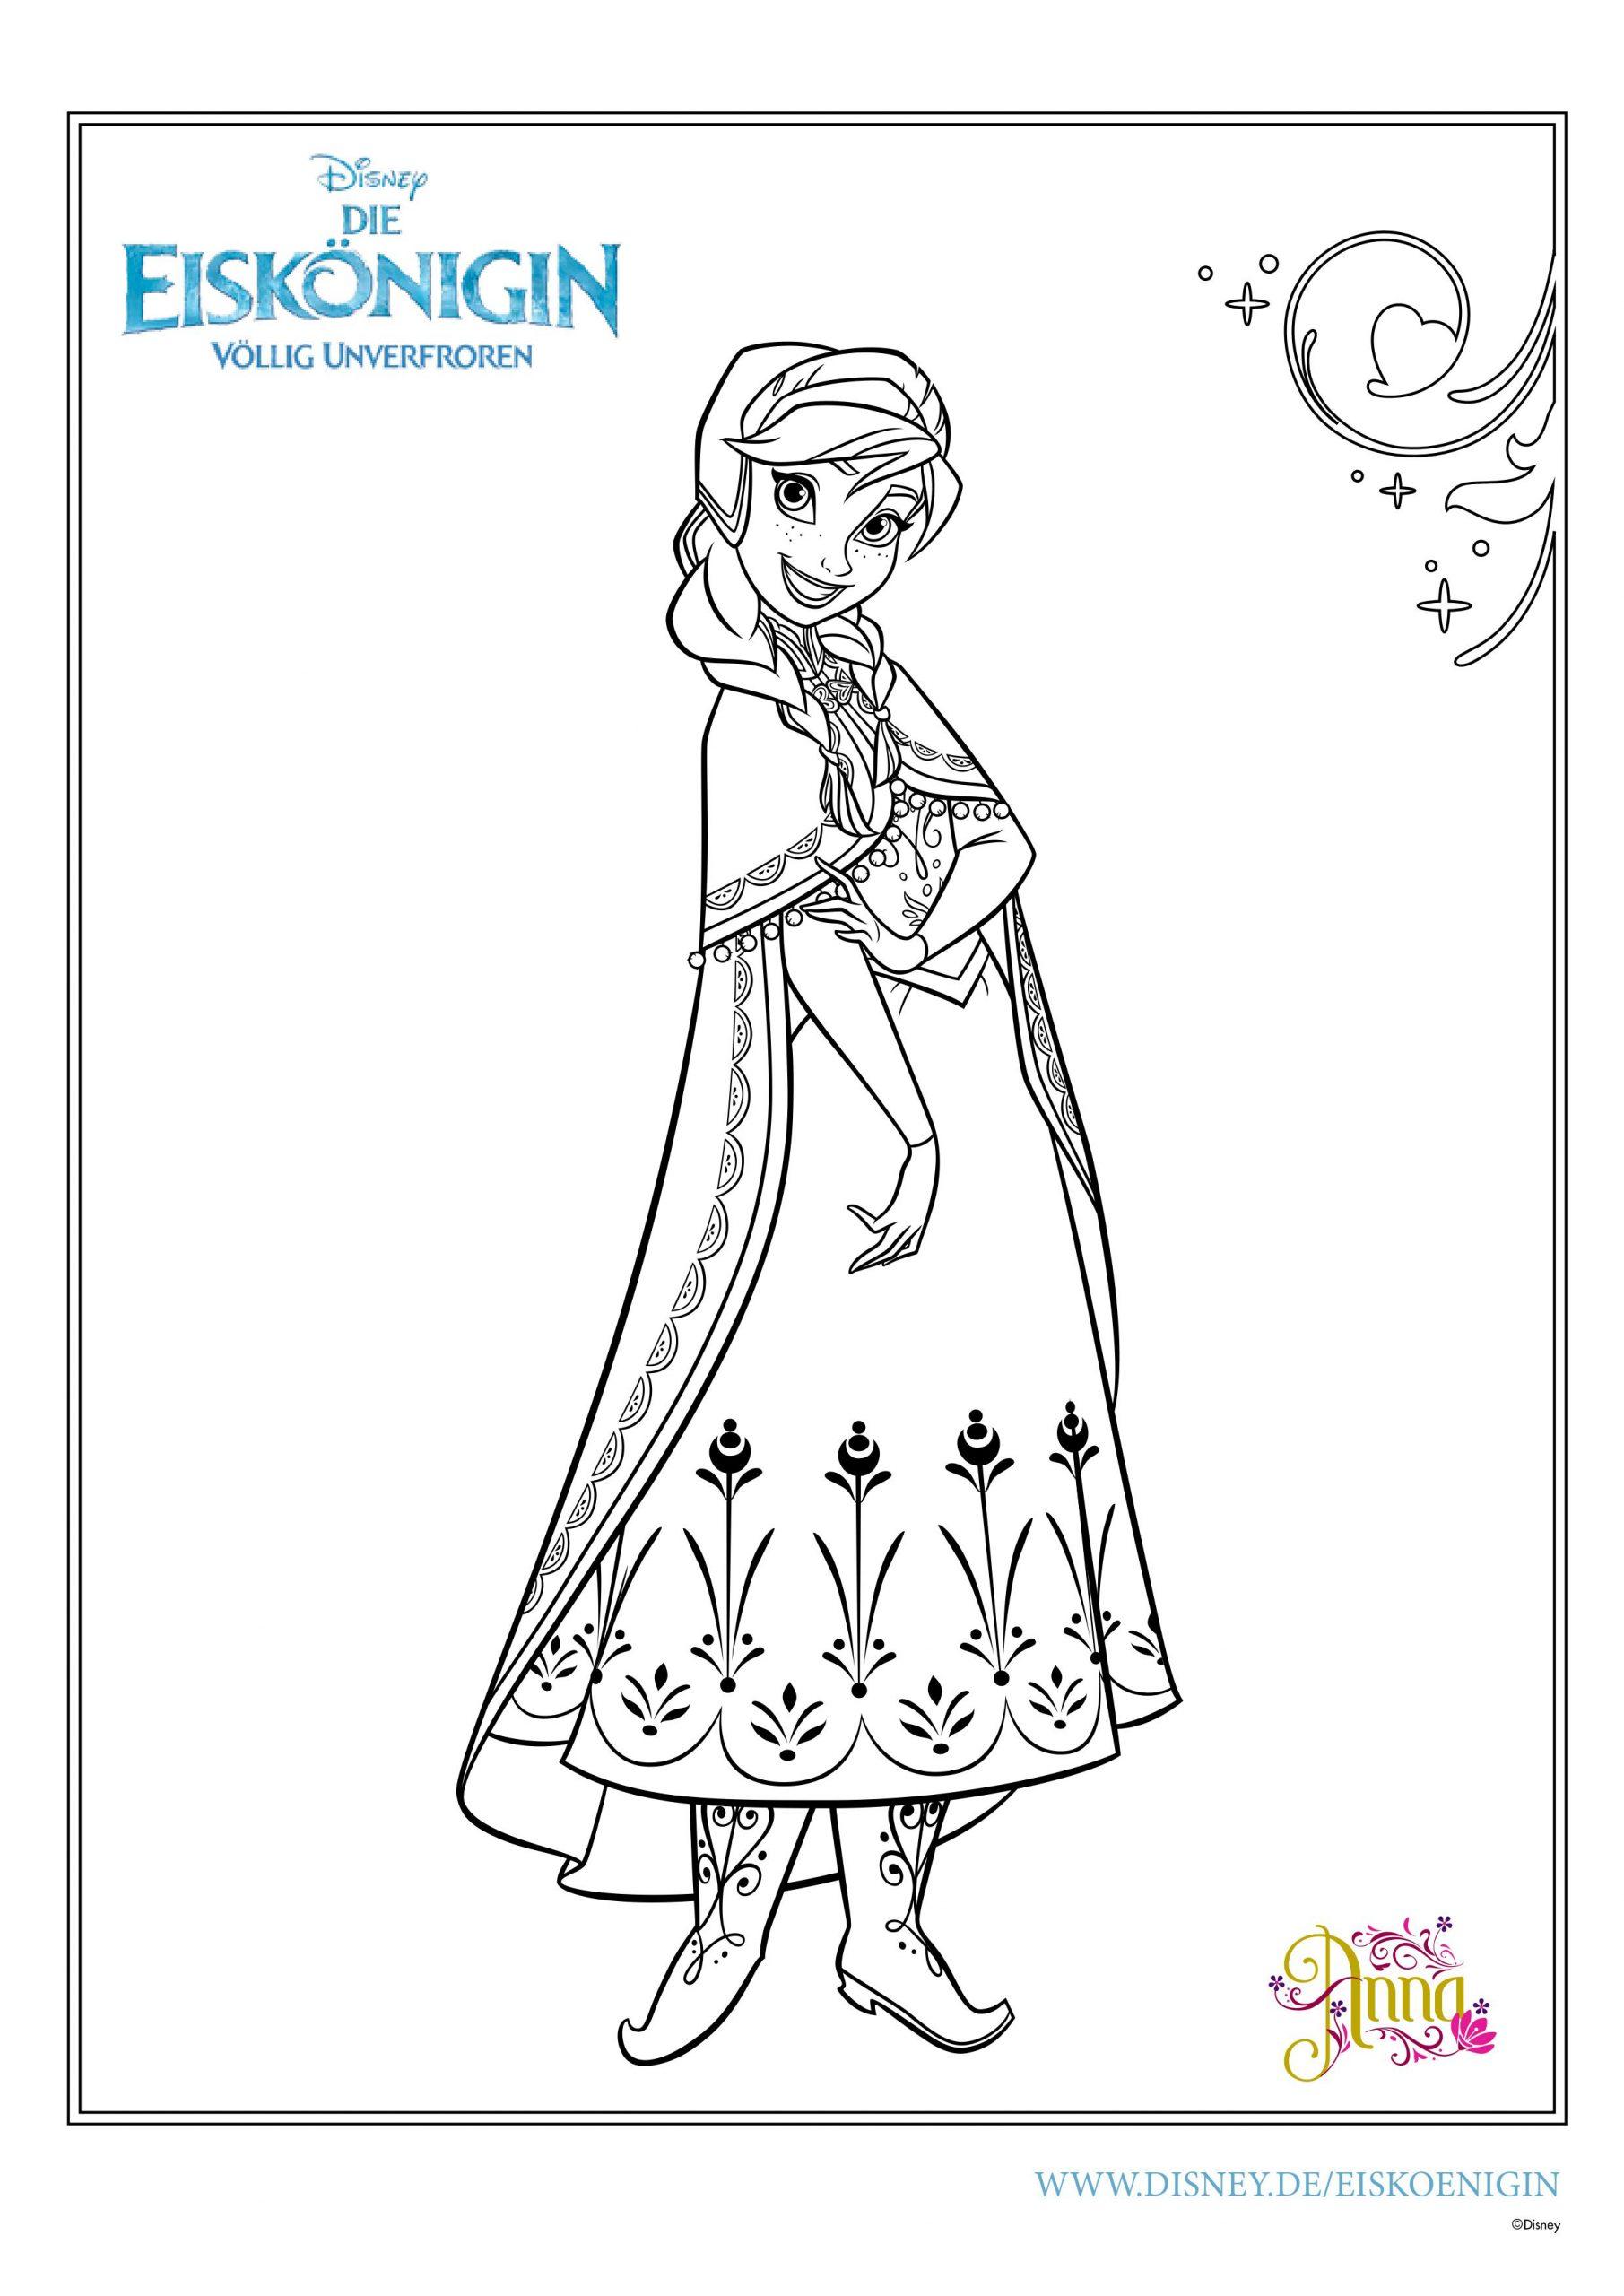 Ausmalbilder Eiskönigin | Mytoys-Blog in Anna Und Elsa Ausmalbilder